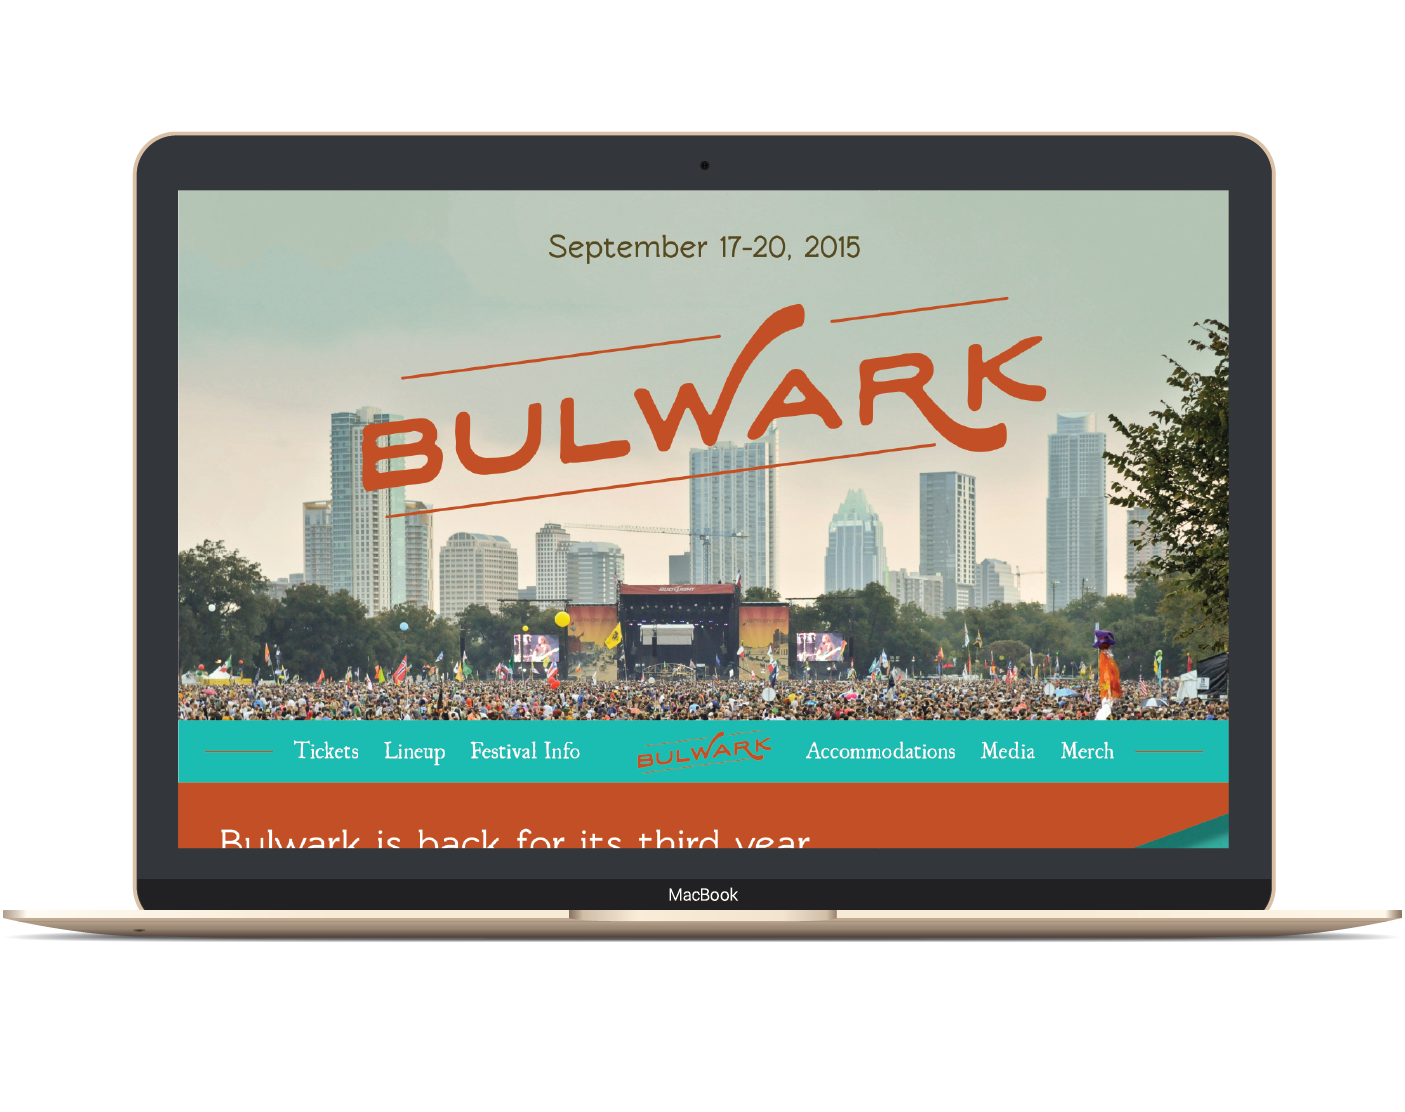 bulwark_webpage.png